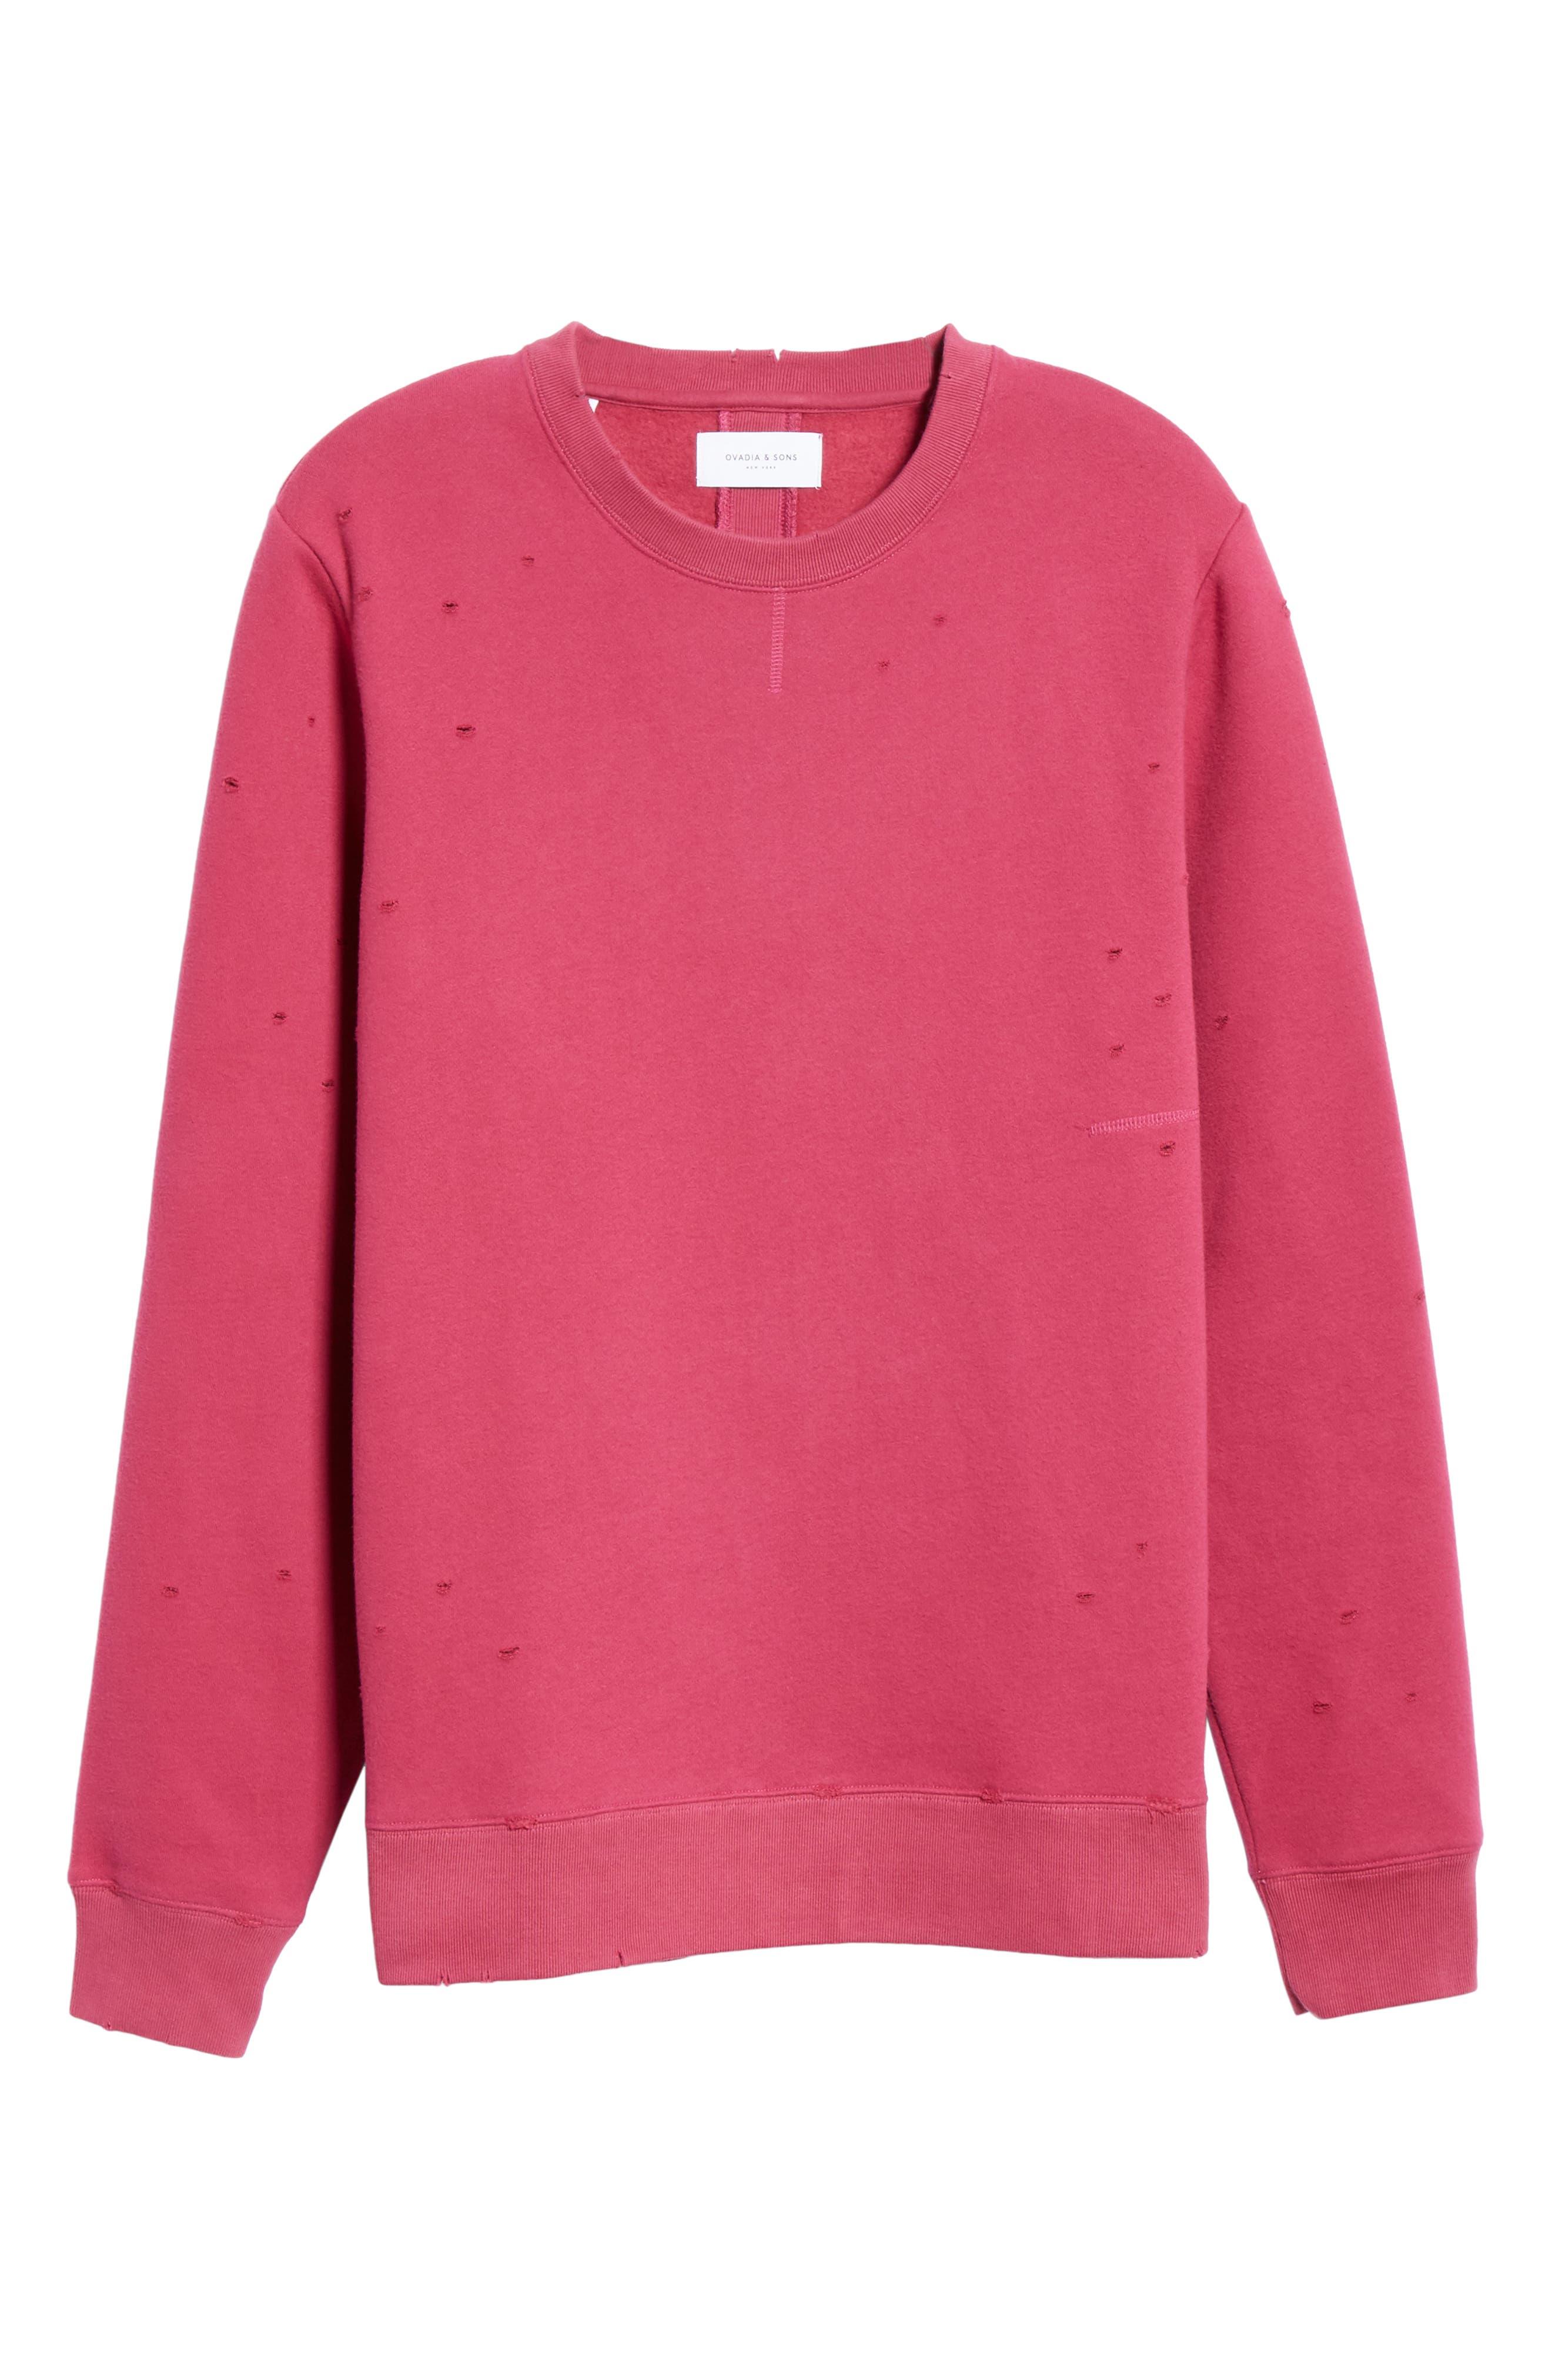 Distressed Crewneck Sweatshirt,                             Alternate thumbnail 6, color,                             RASBERRY